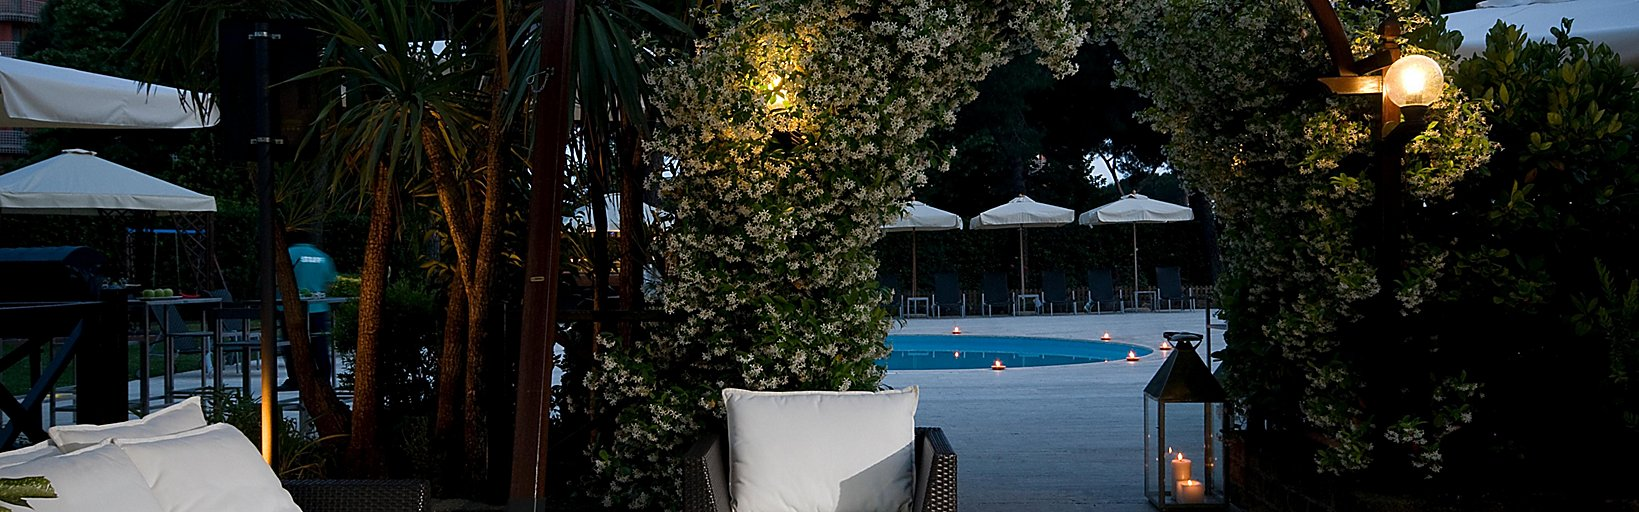 Business Hotel: Holiday Inn Rom - Eur Parco Dei Medici